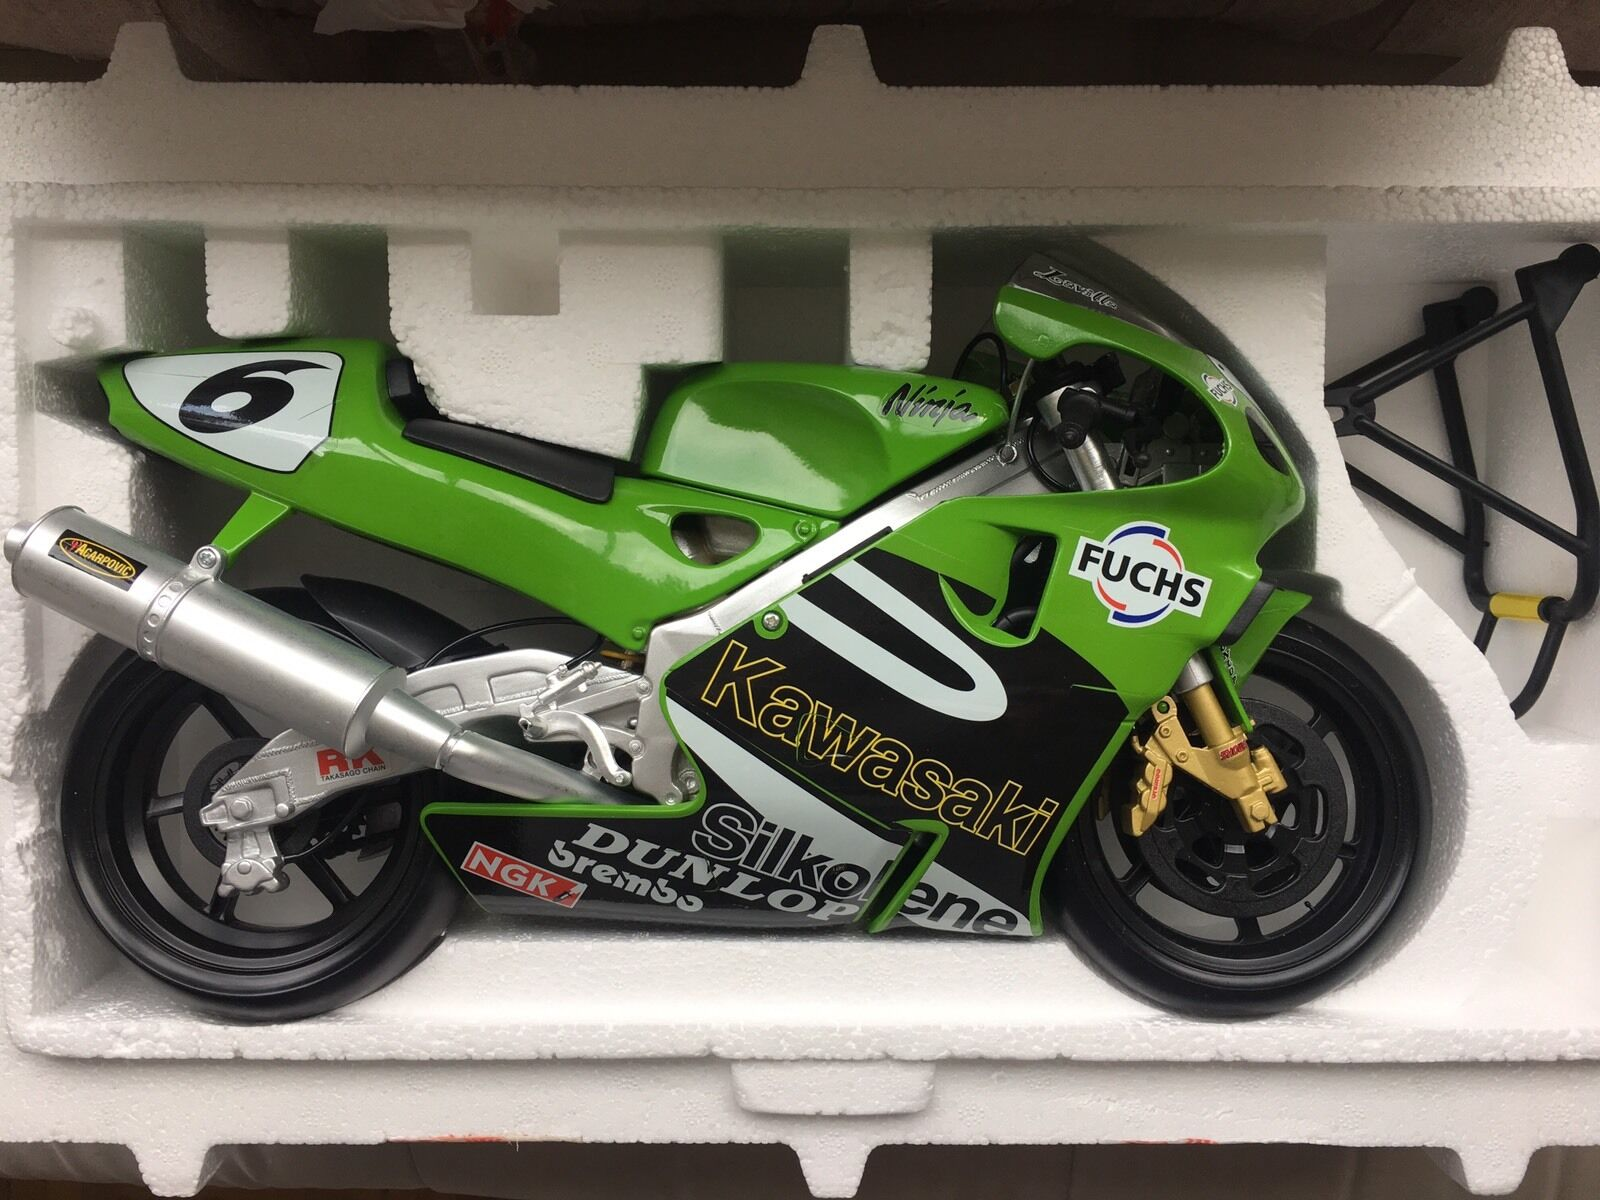 Guiloy Kawasaki ZX 7RR Ninja Fuchs Metal tärningskast 1  6 MotoGP 2001 Laville tävlings